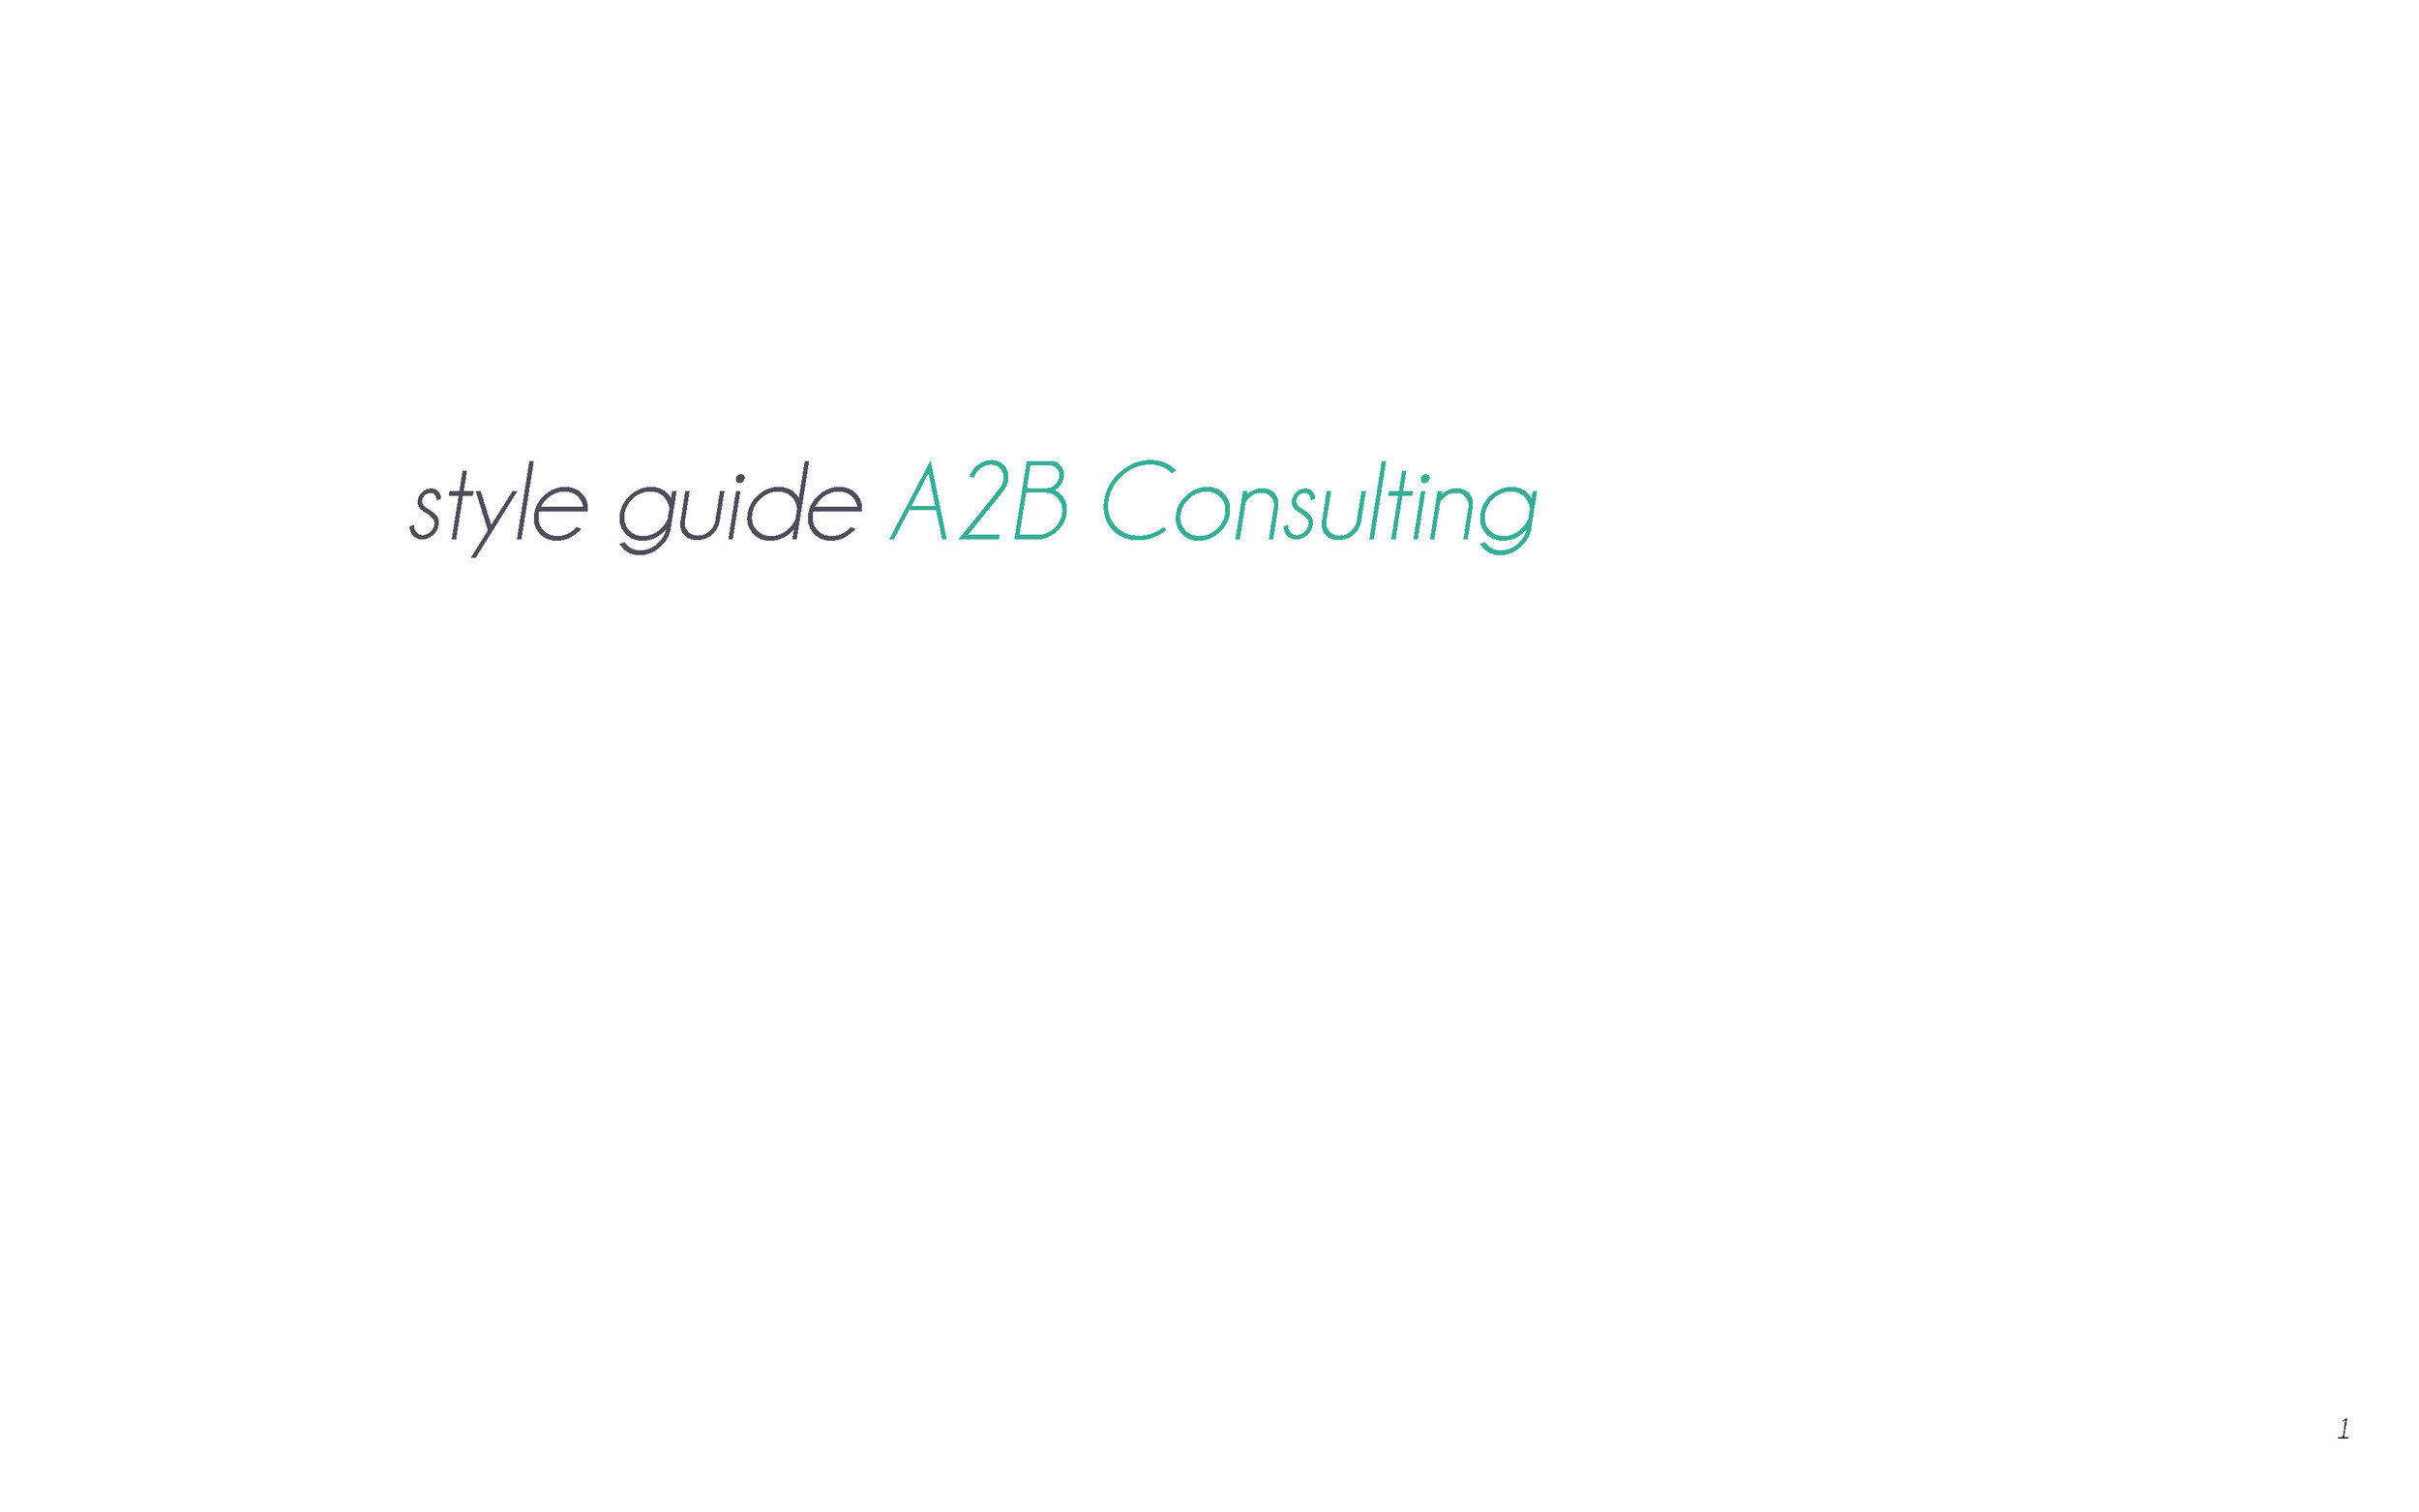 StyleGuide_A2B_02_27_Page_01.jpg